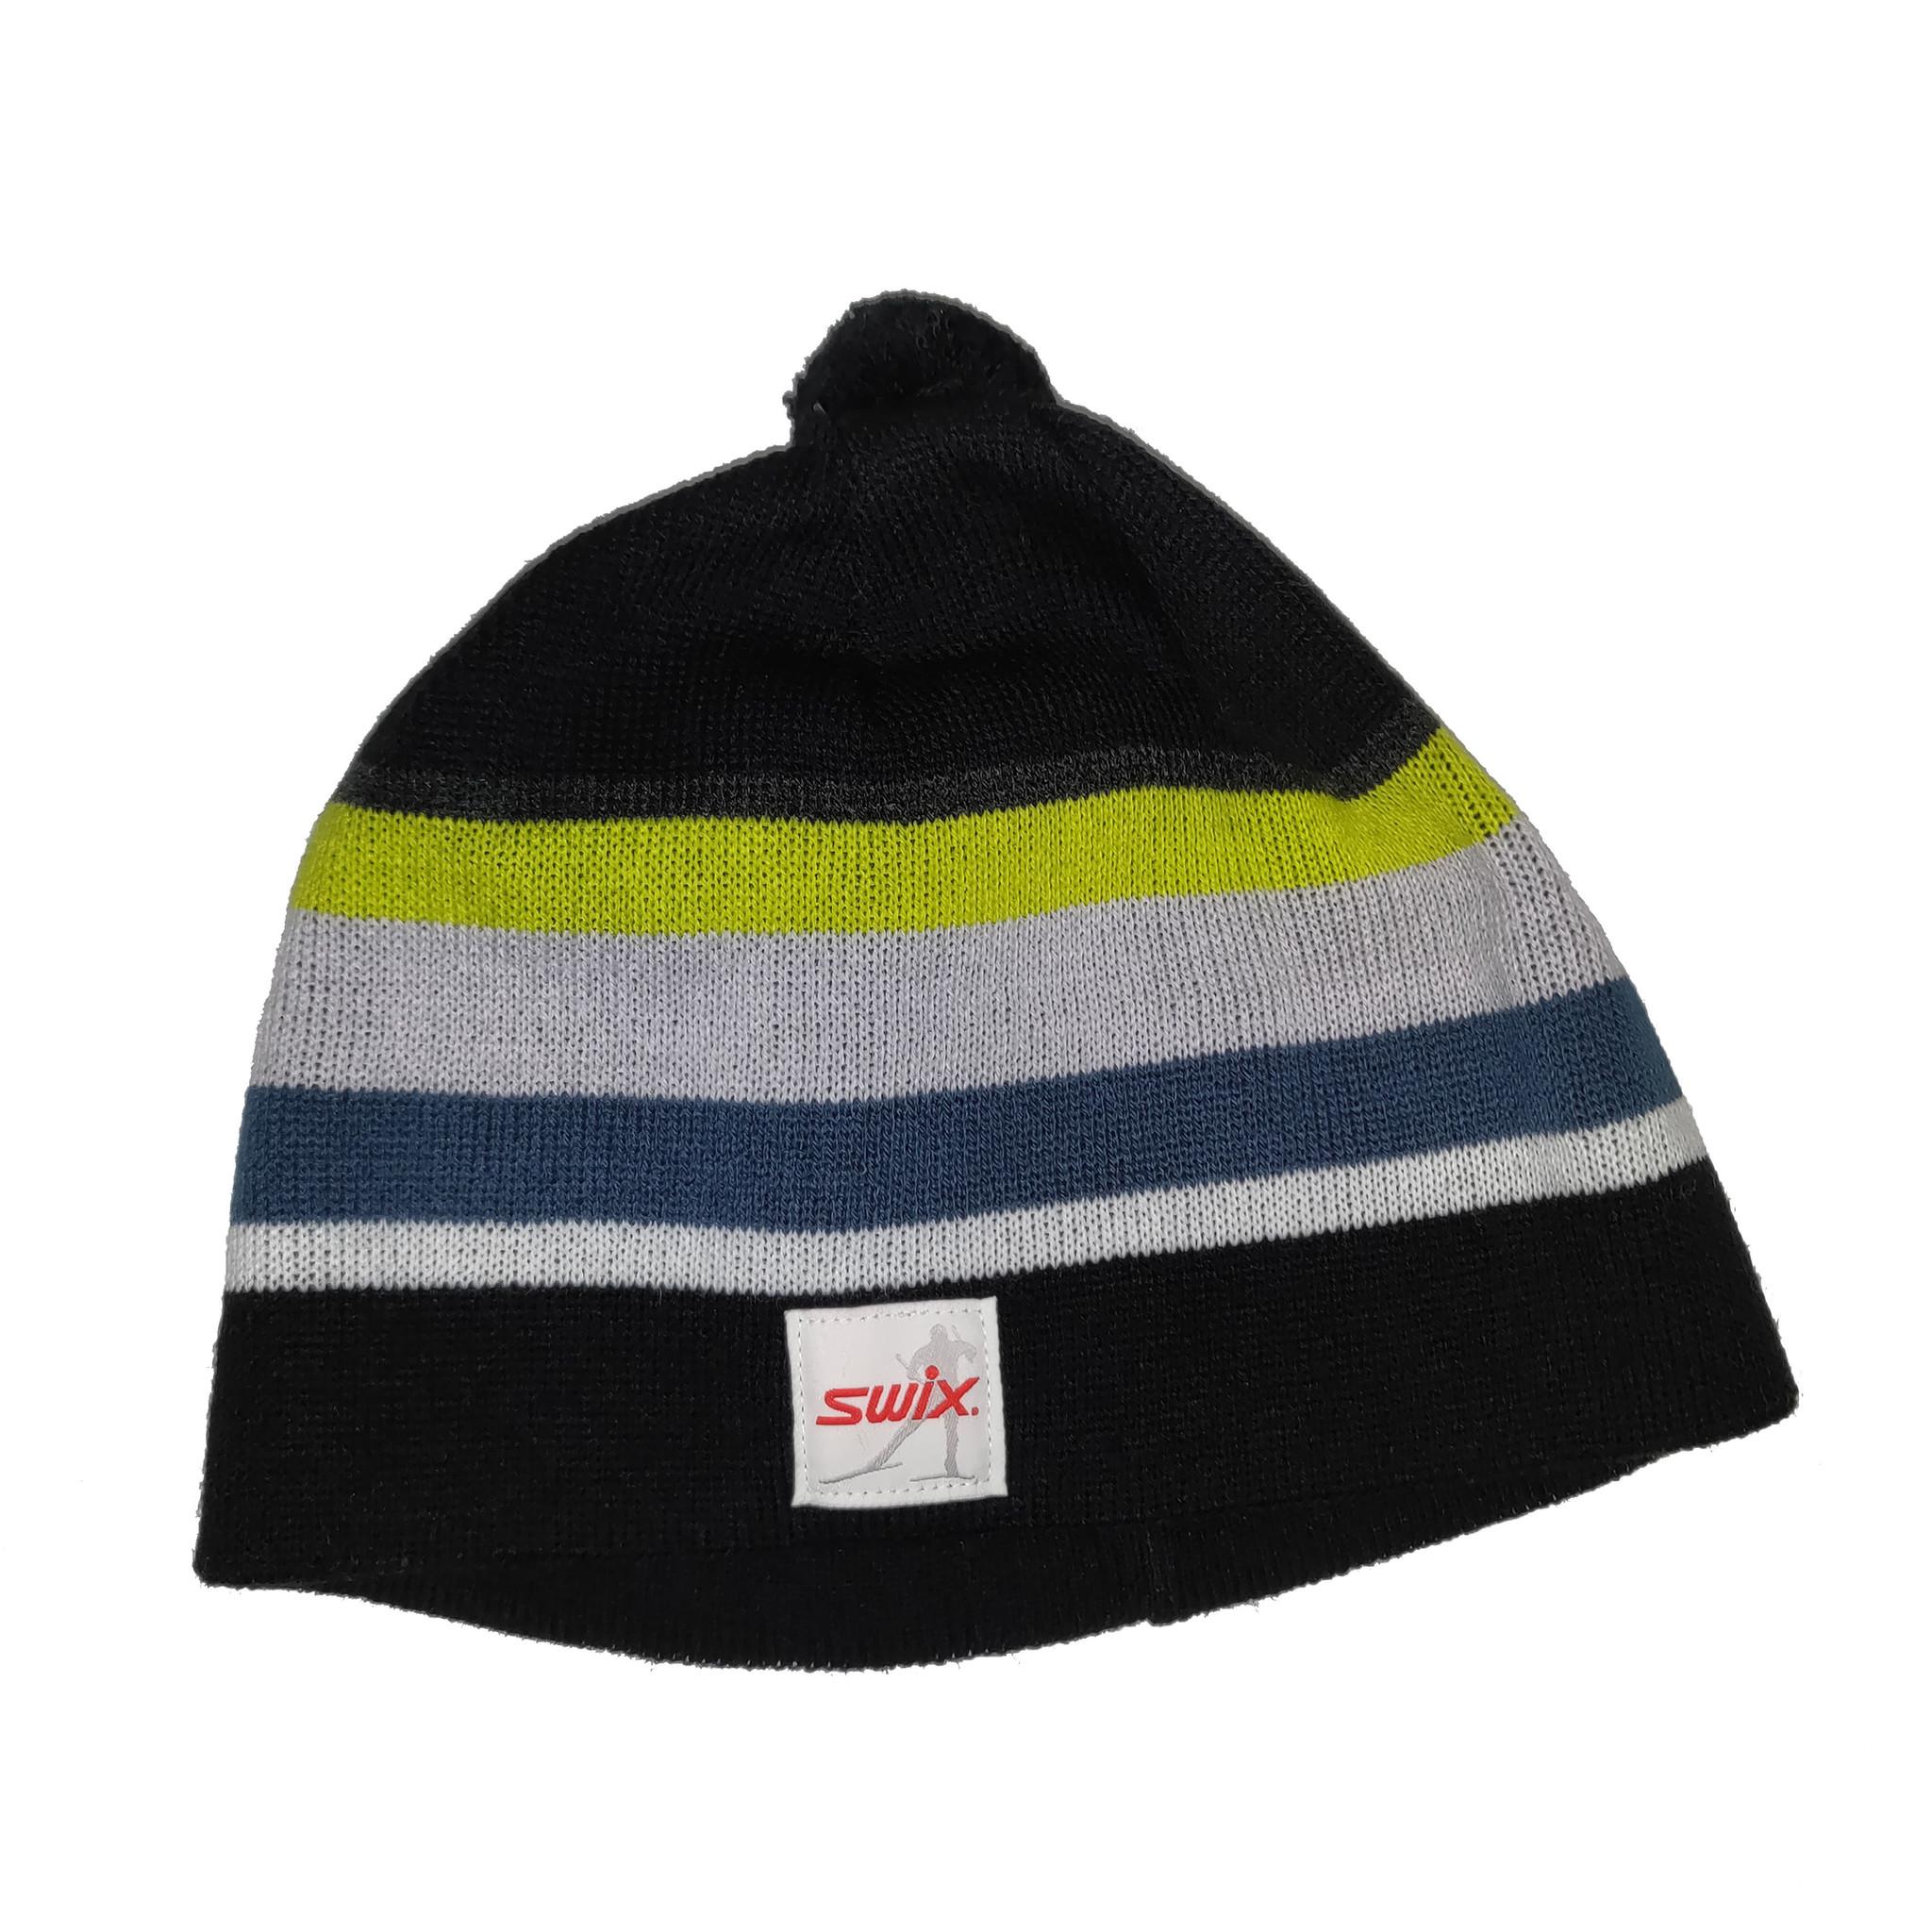 Swix Swix Dirk Hat Black